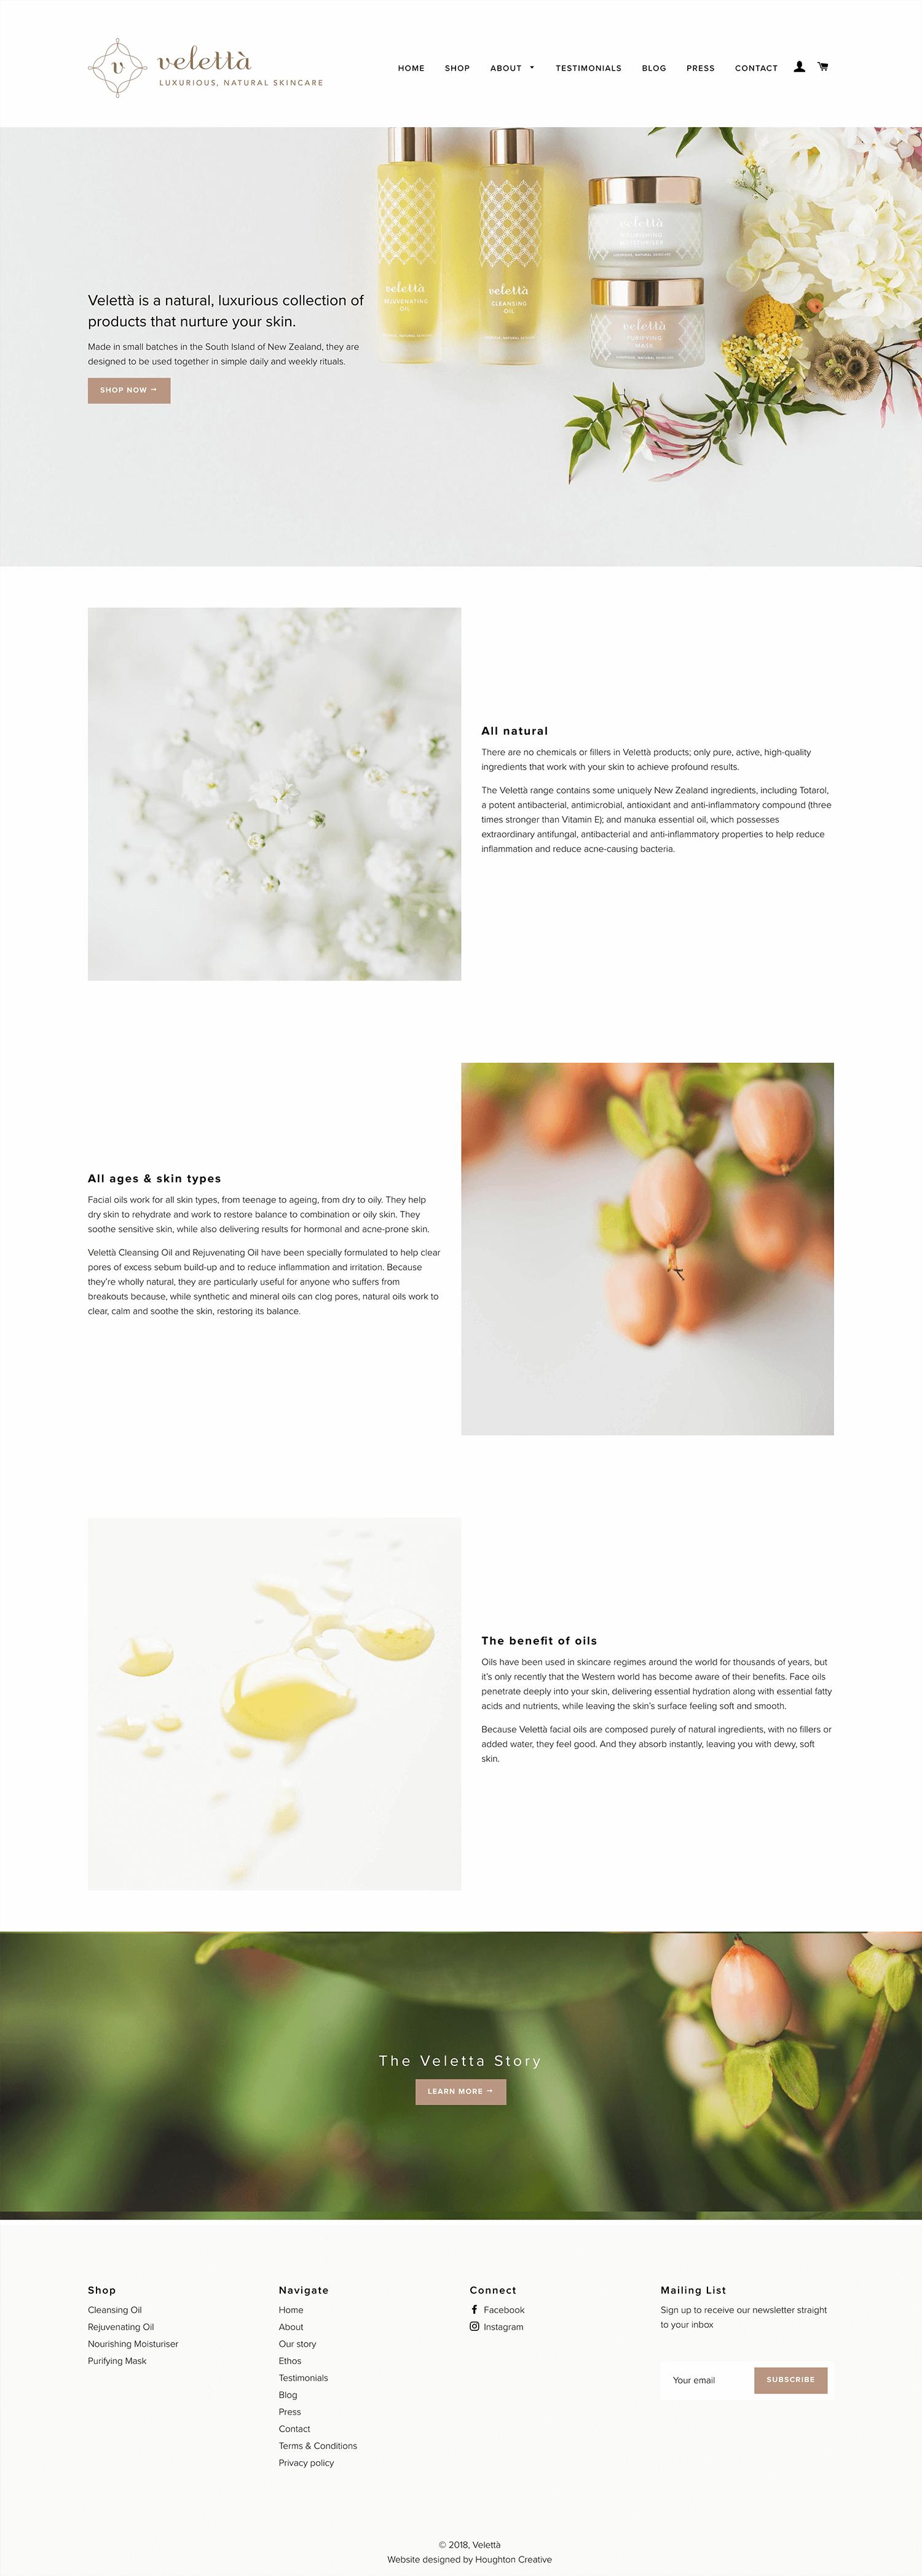 Velettà Skincare about page